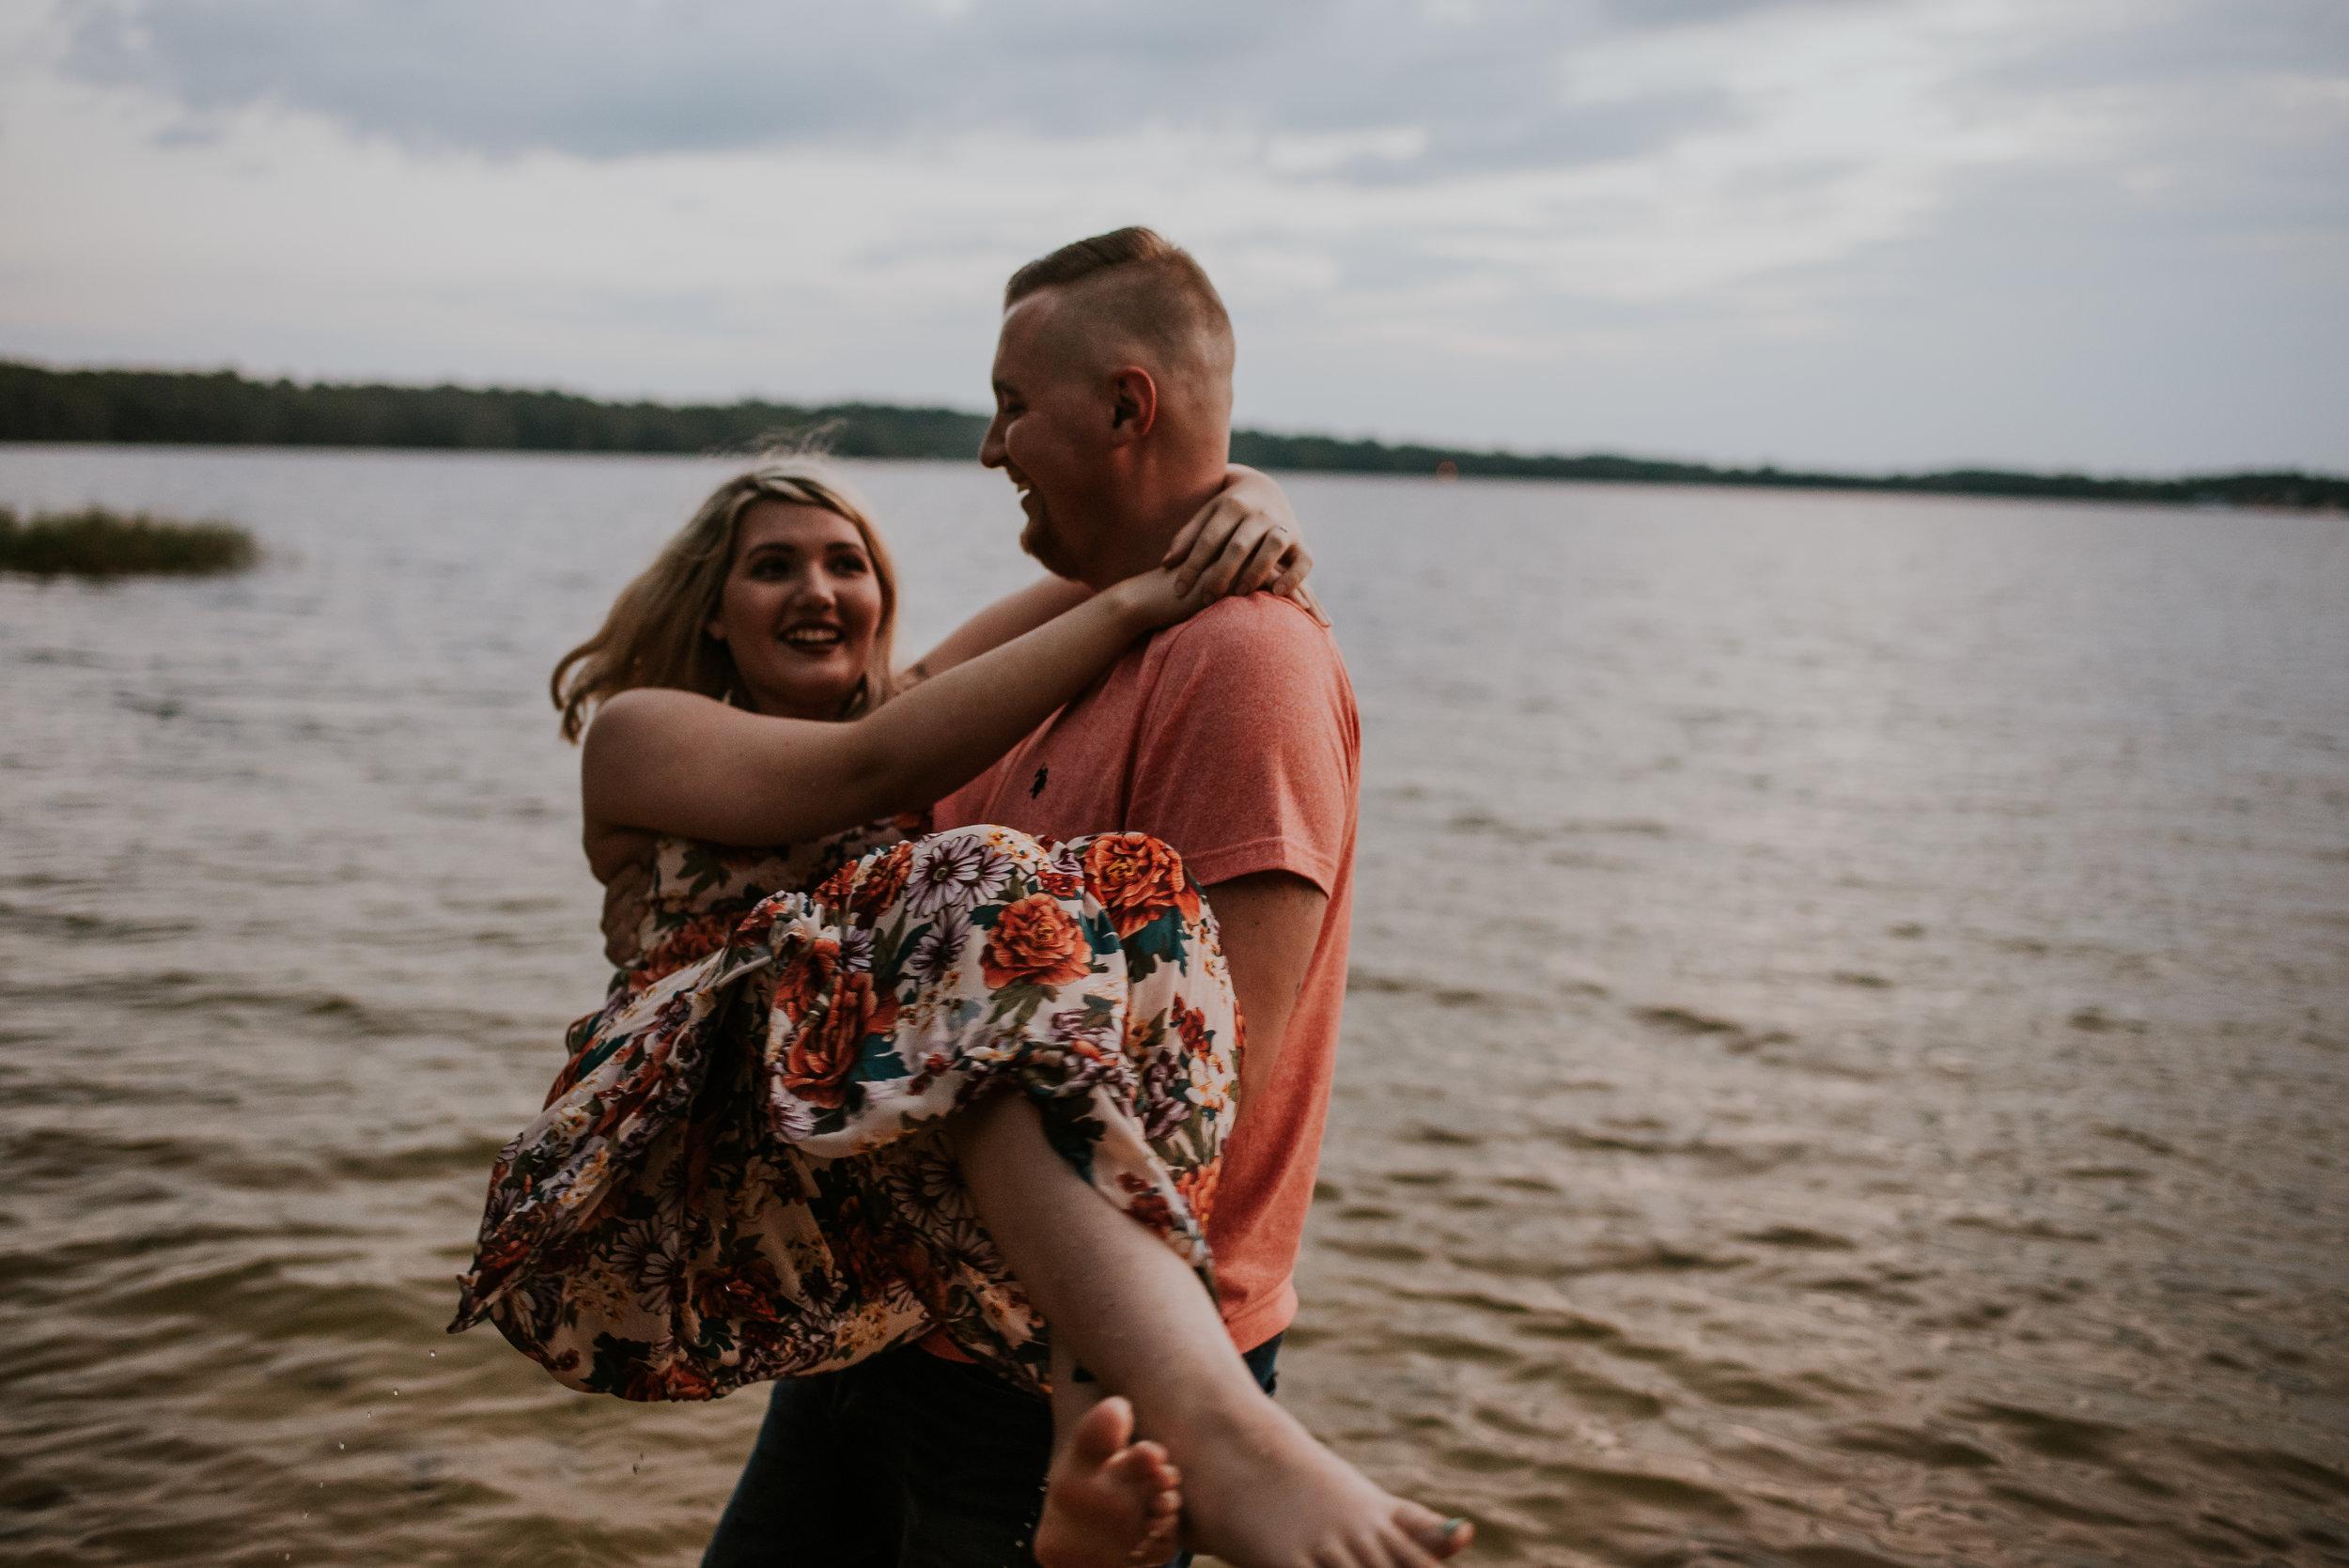 kimberly-trey-crestview-florida-couples-photographer-84.jpg